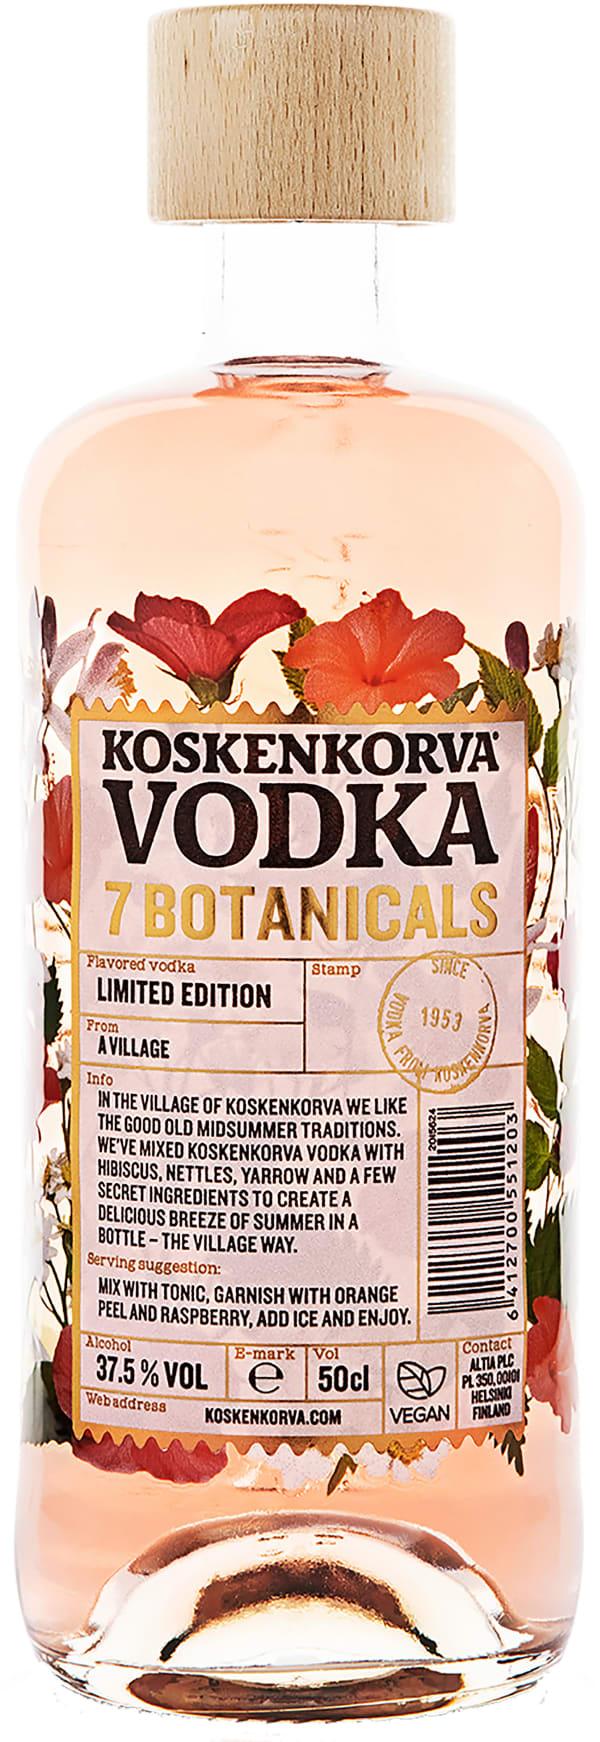 Koskenkorva Vodka Botanicals